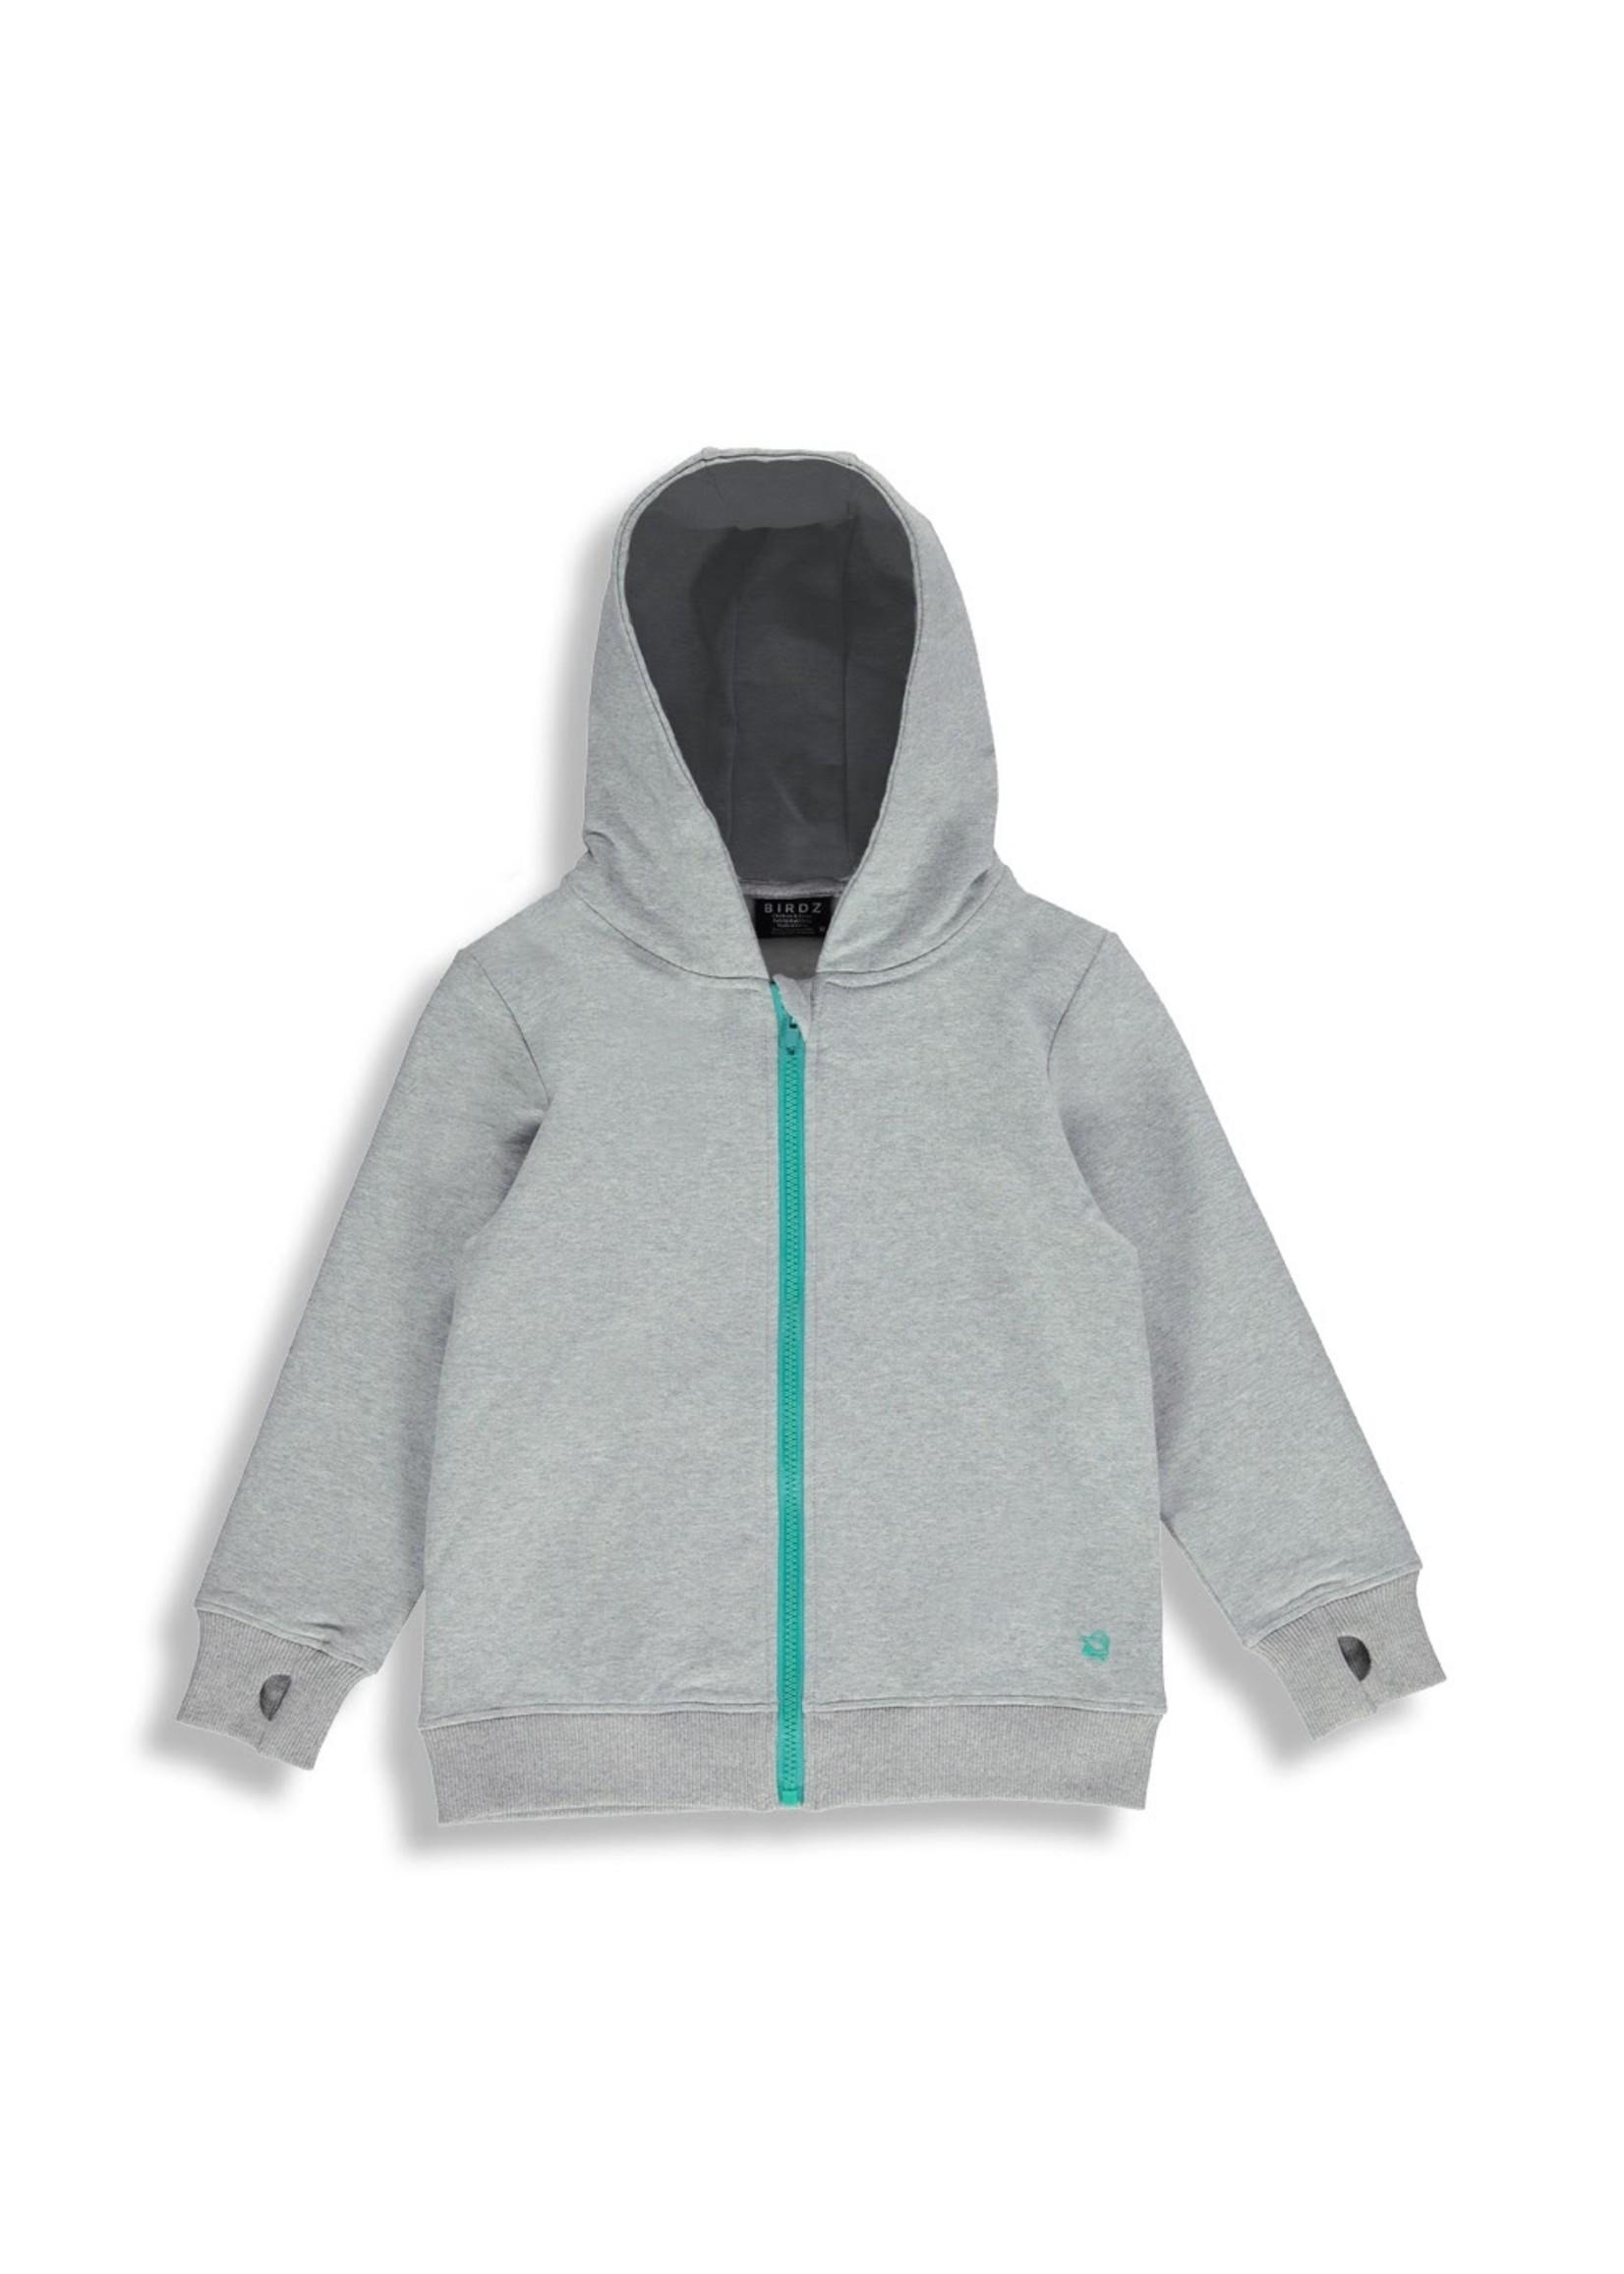 Birdz Veste Sunset hoodie